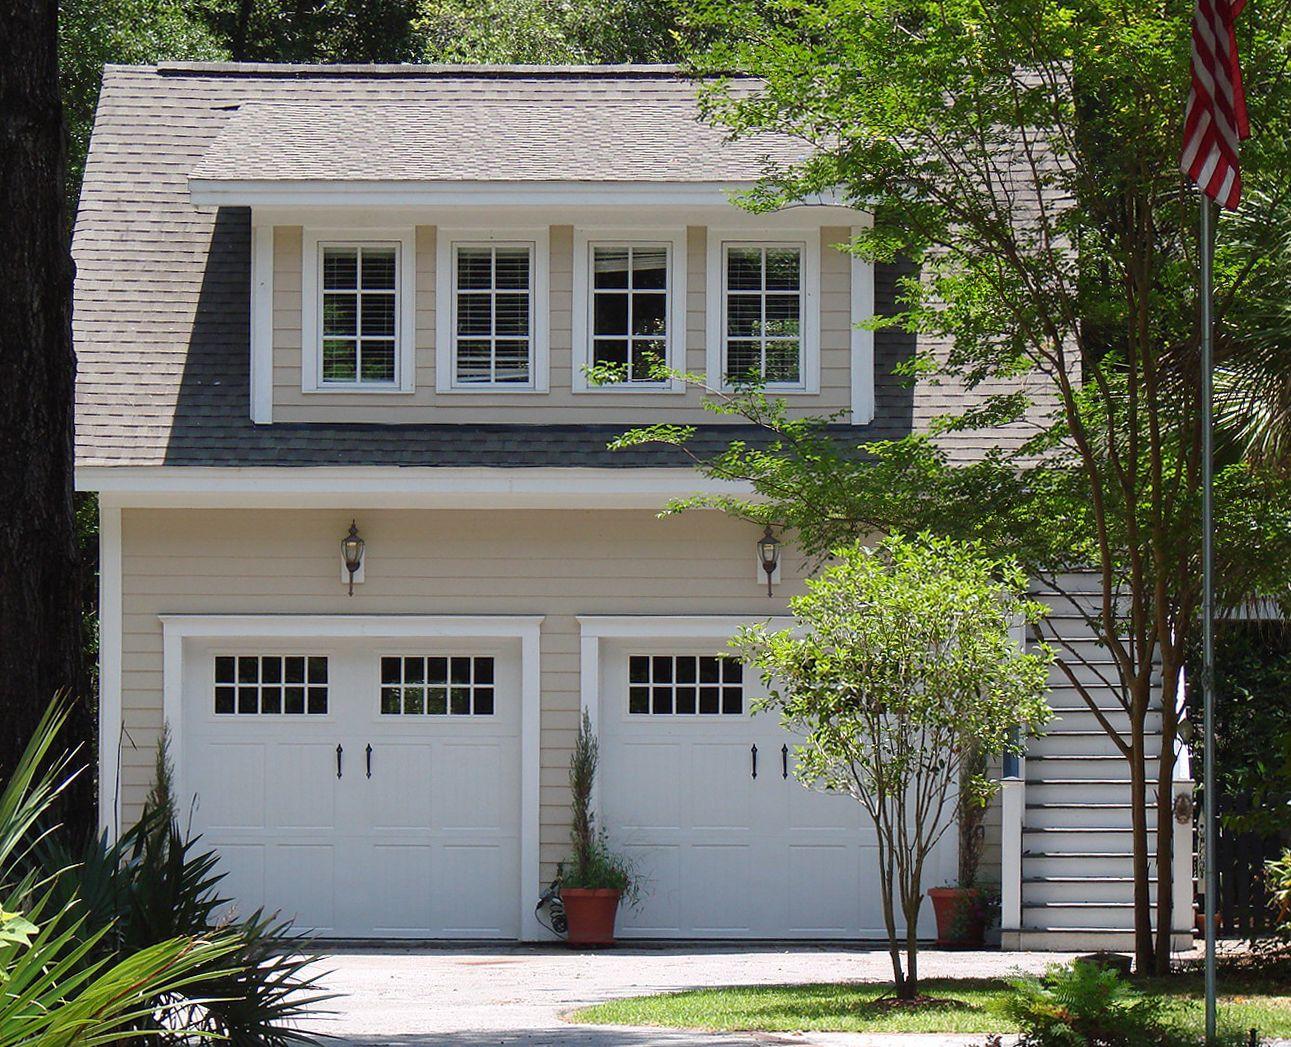 Carriage House Design Plans Authorityformulas Four Window